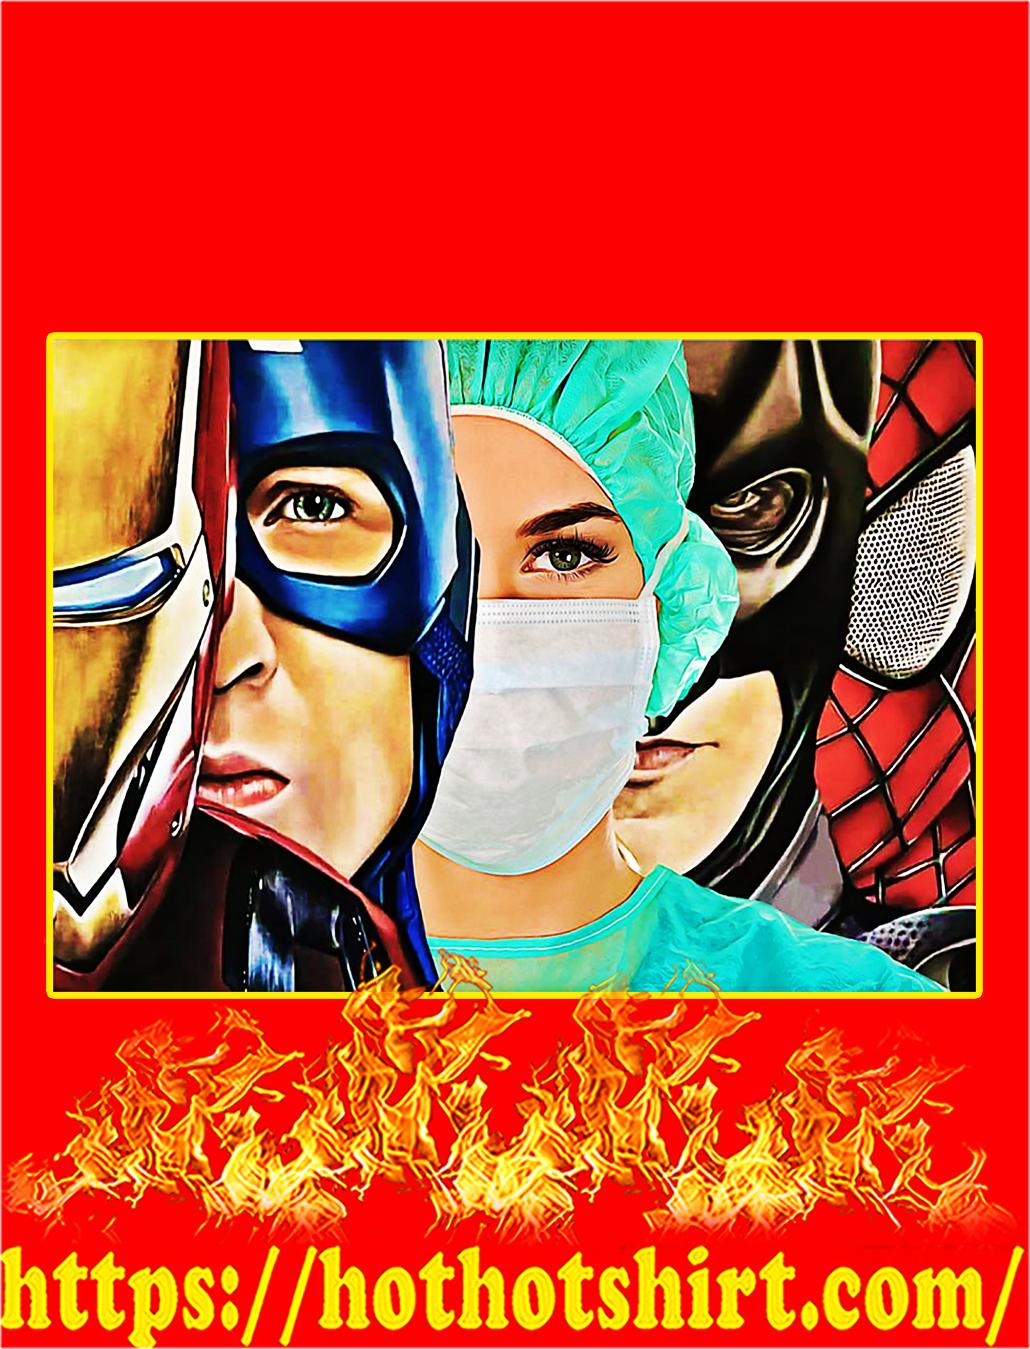 Nurse Superhero Iron Man Poster - A4